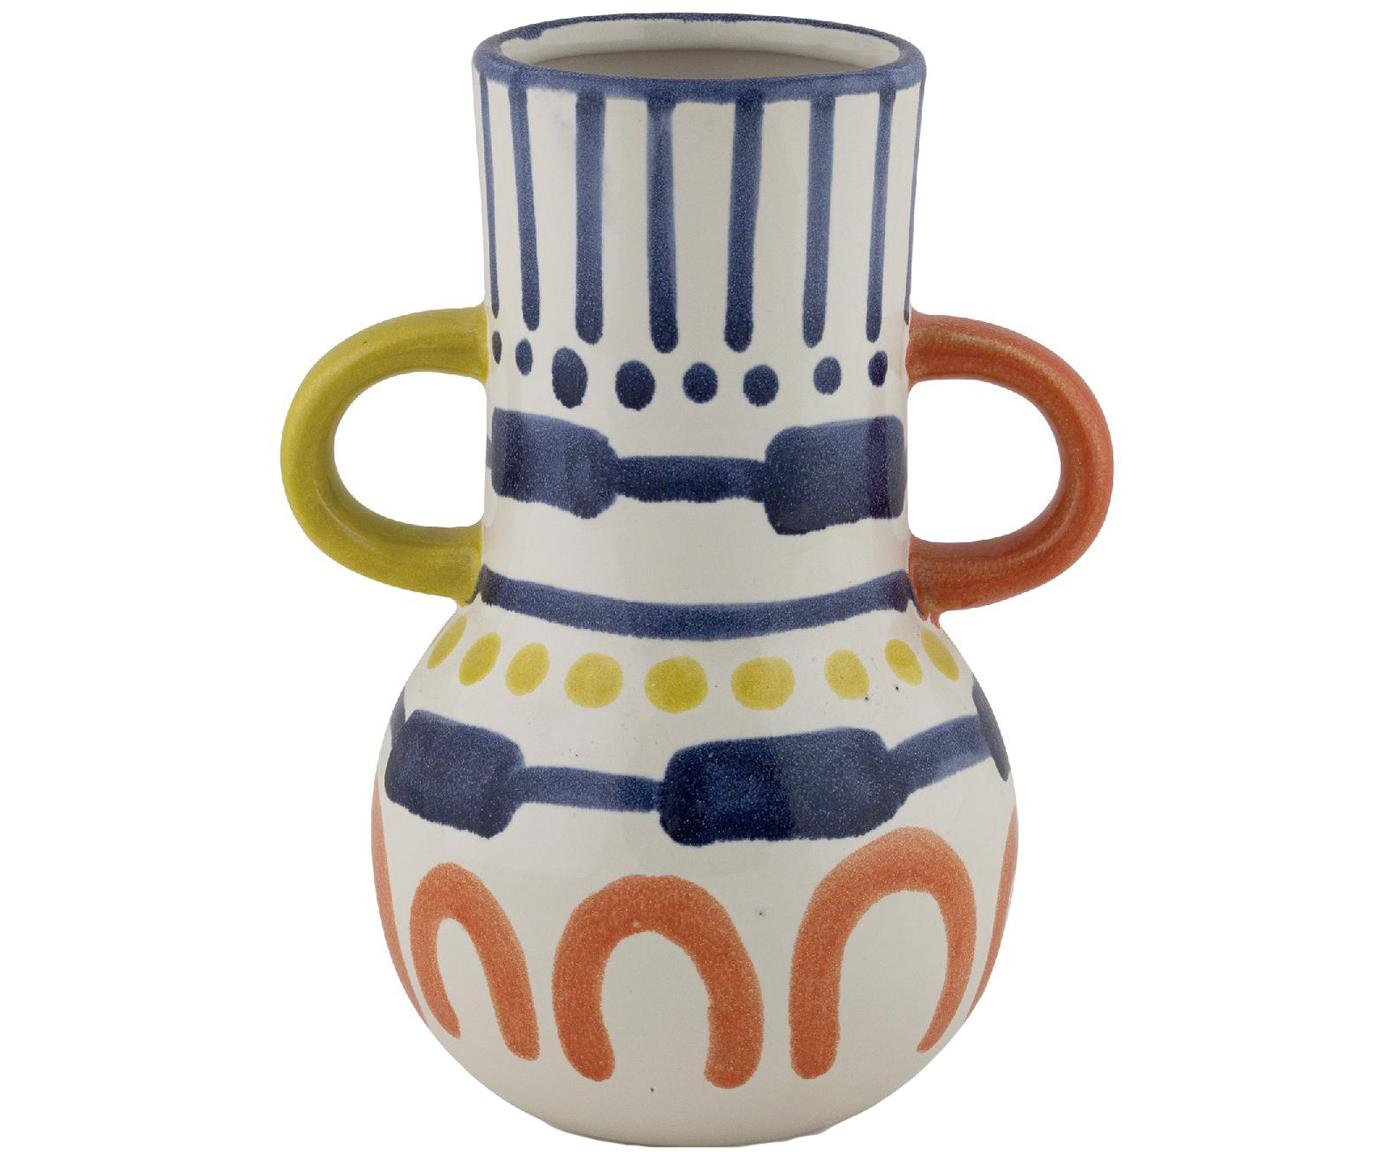 Bemalte Vase Majorelle aus Keramik, Keramik, Mehrfarbig, 15 x 20 cm